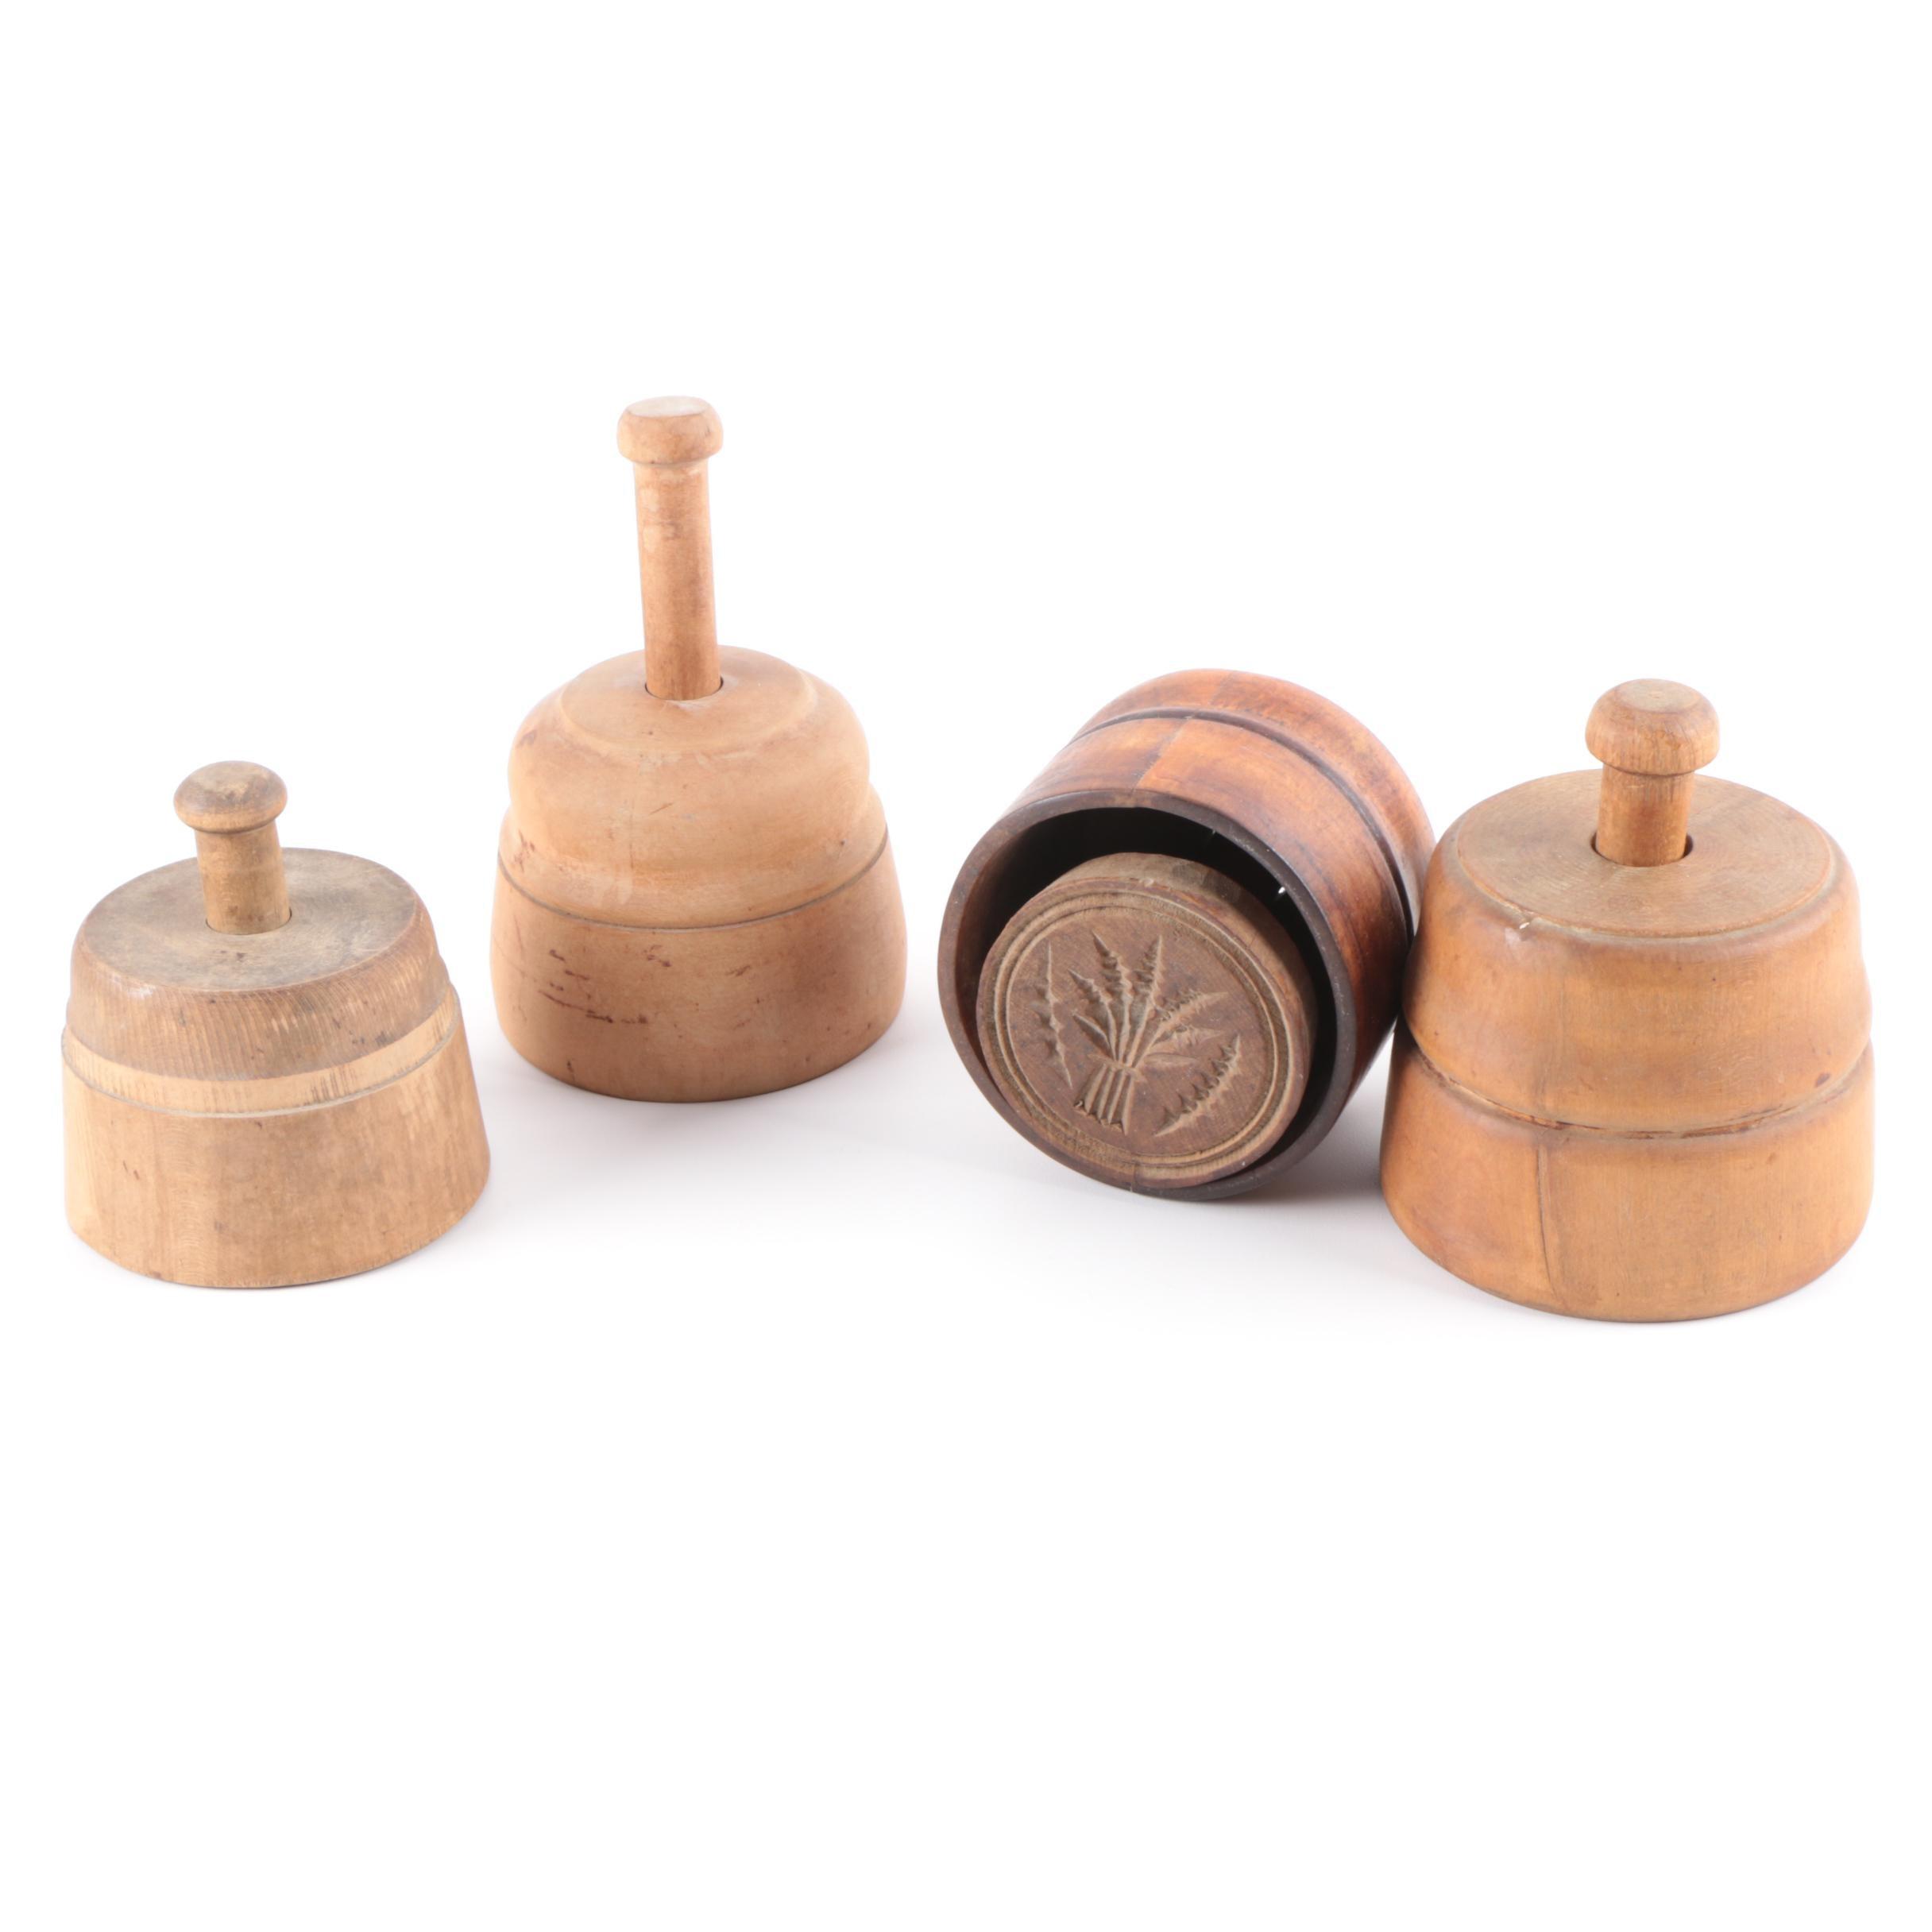 Four Antique Wooden Butter Molds